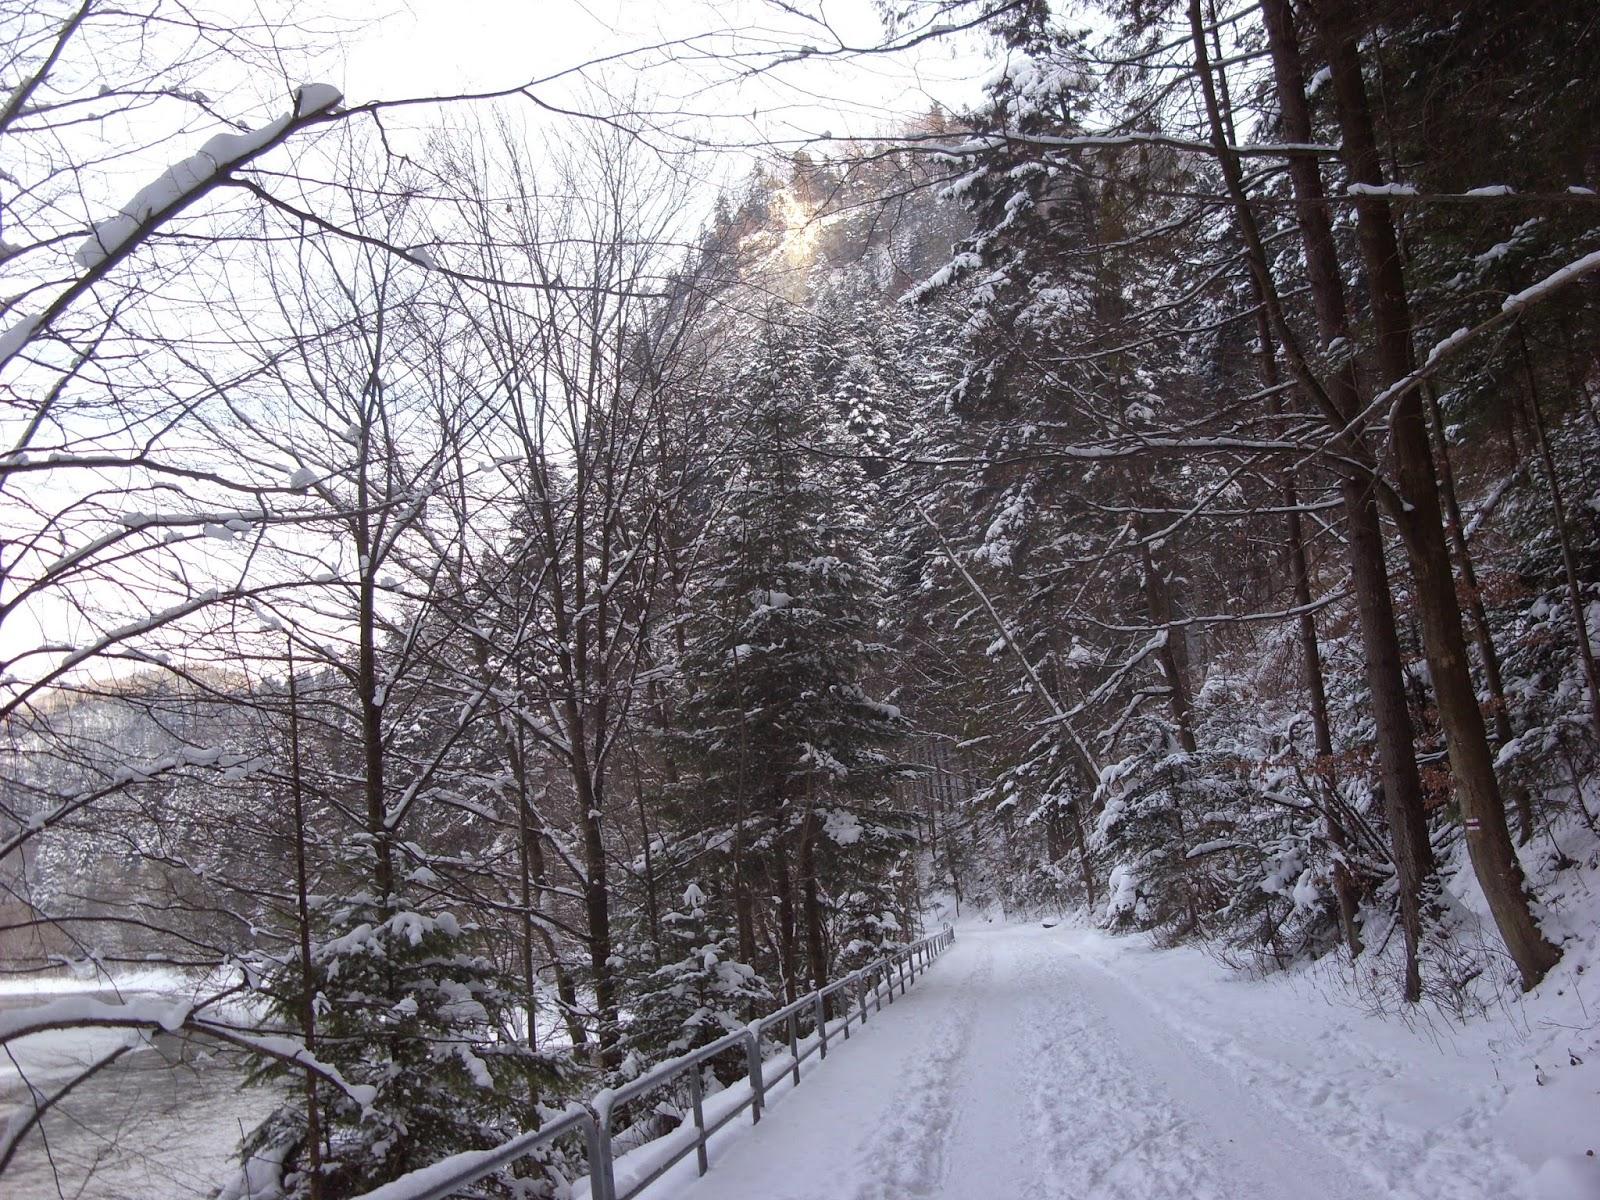 Droga pienińska zimą